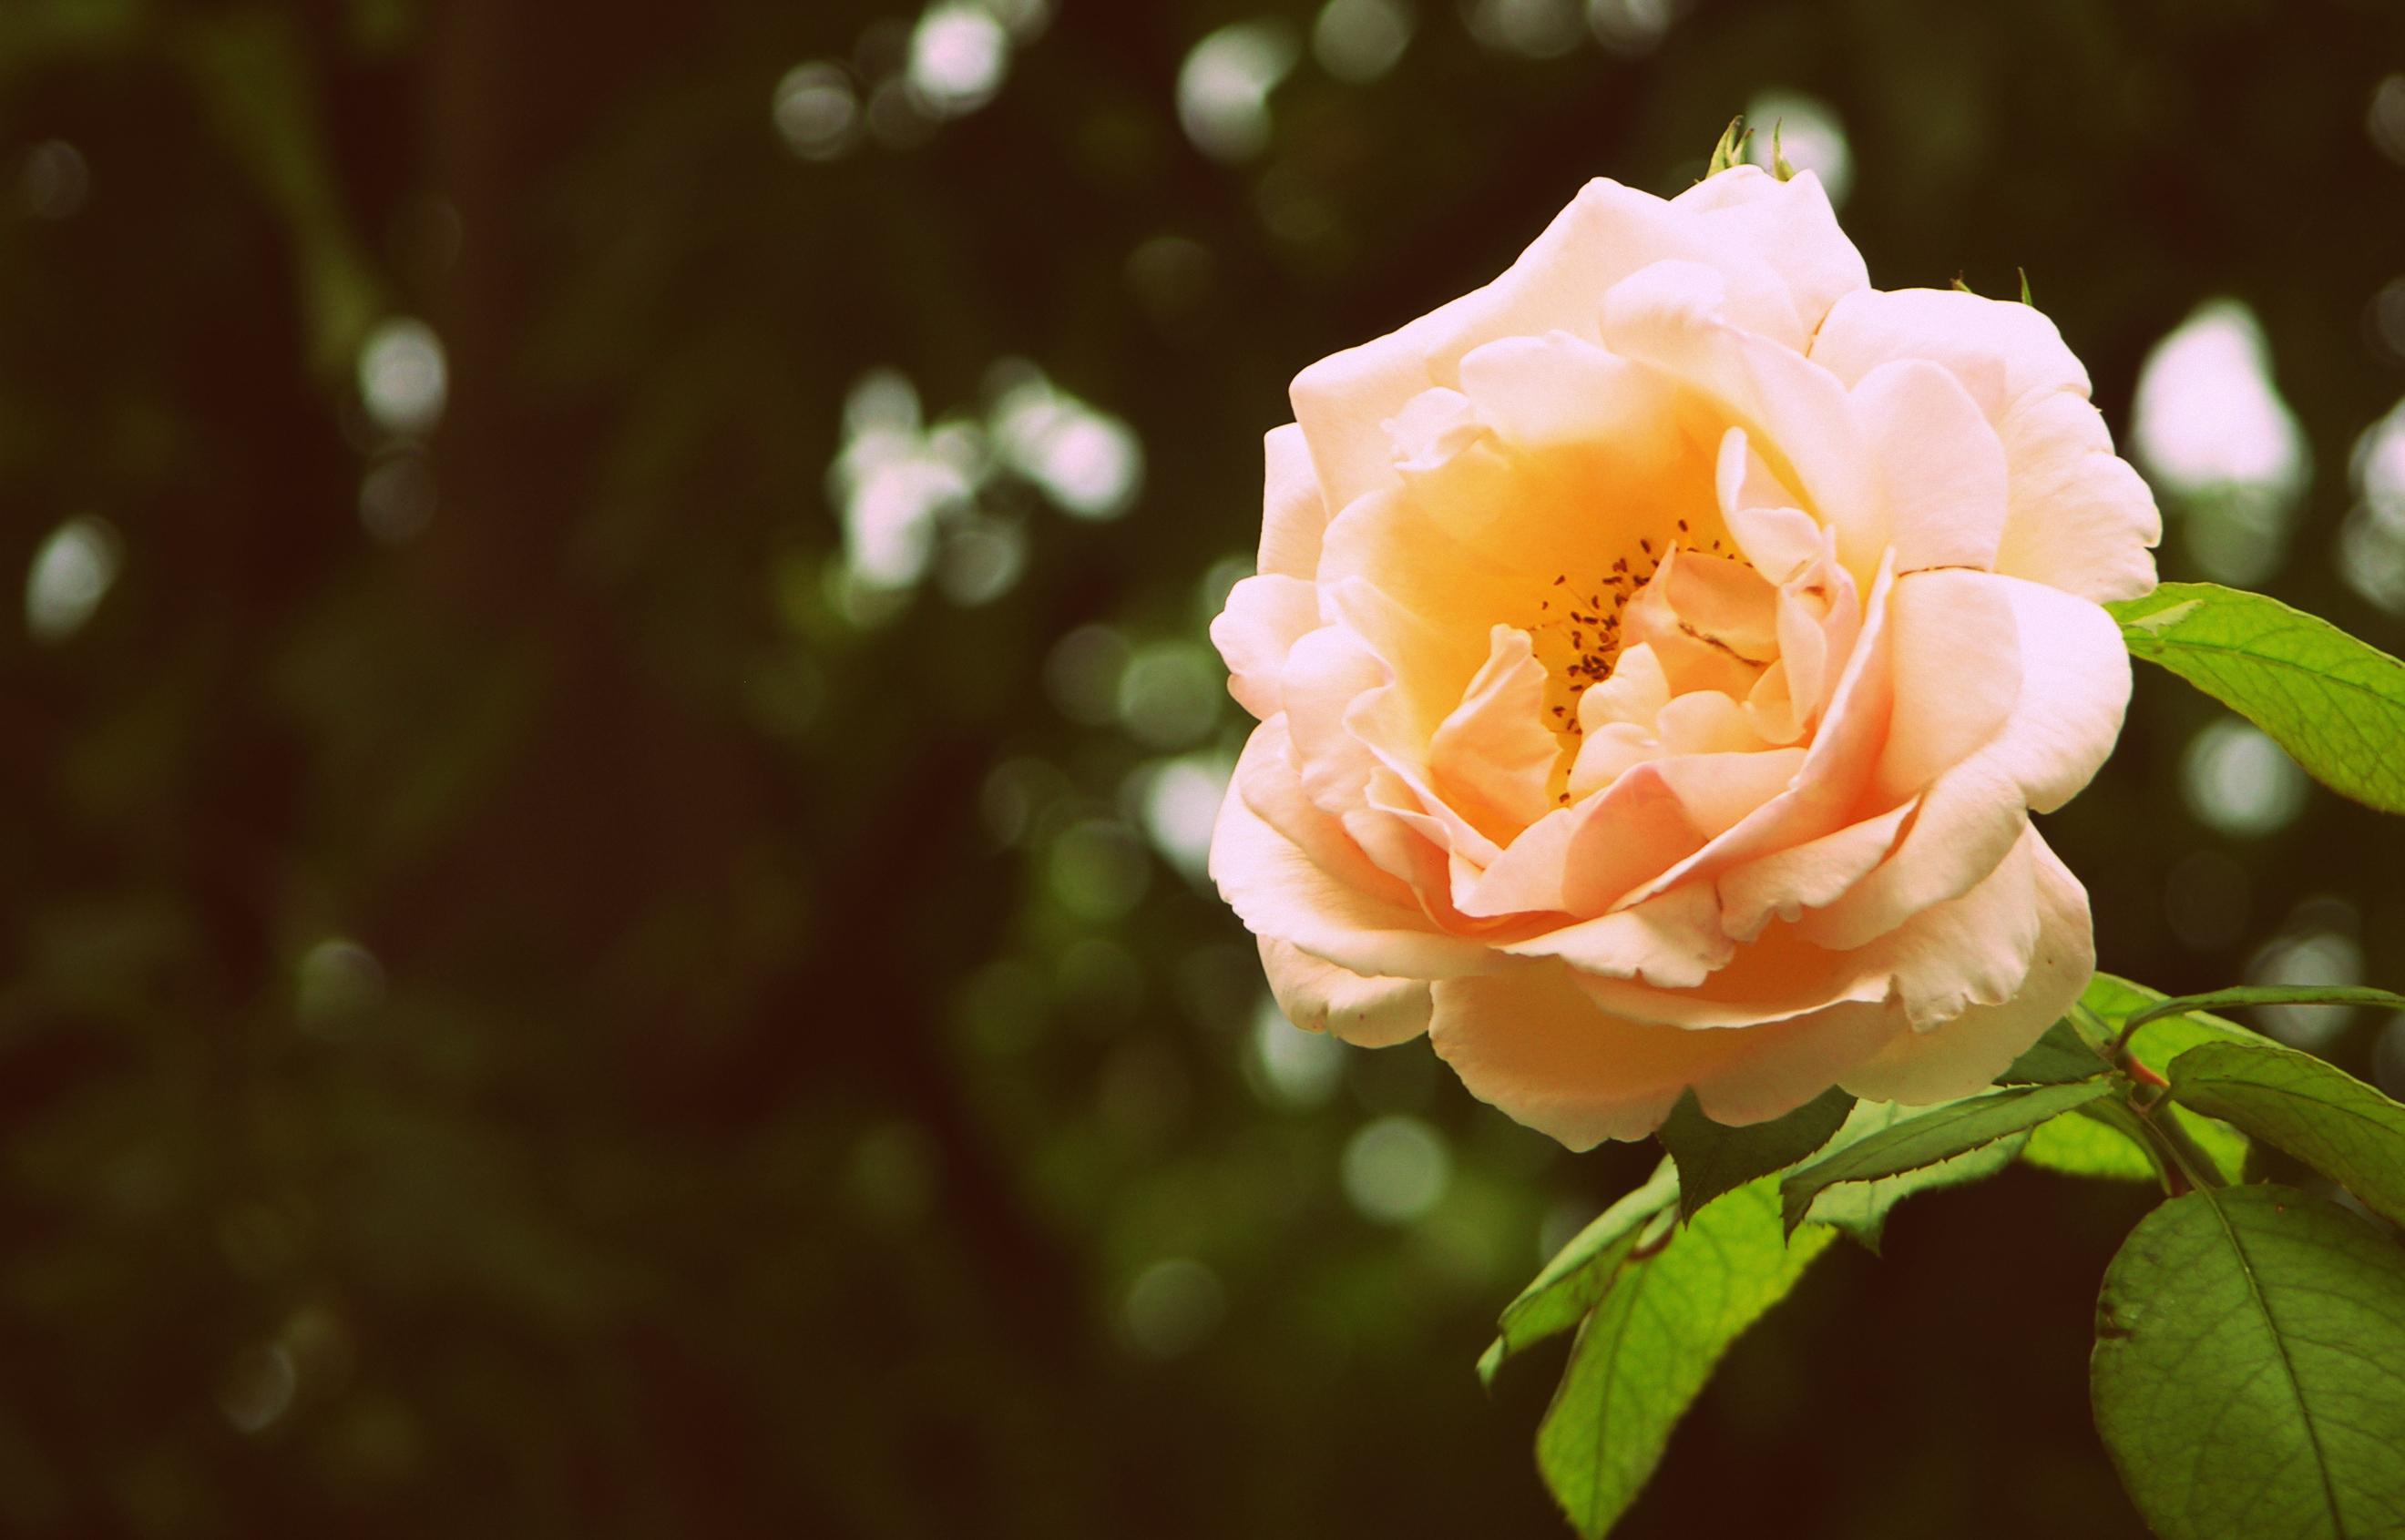 роза, лепестки, листья без смс